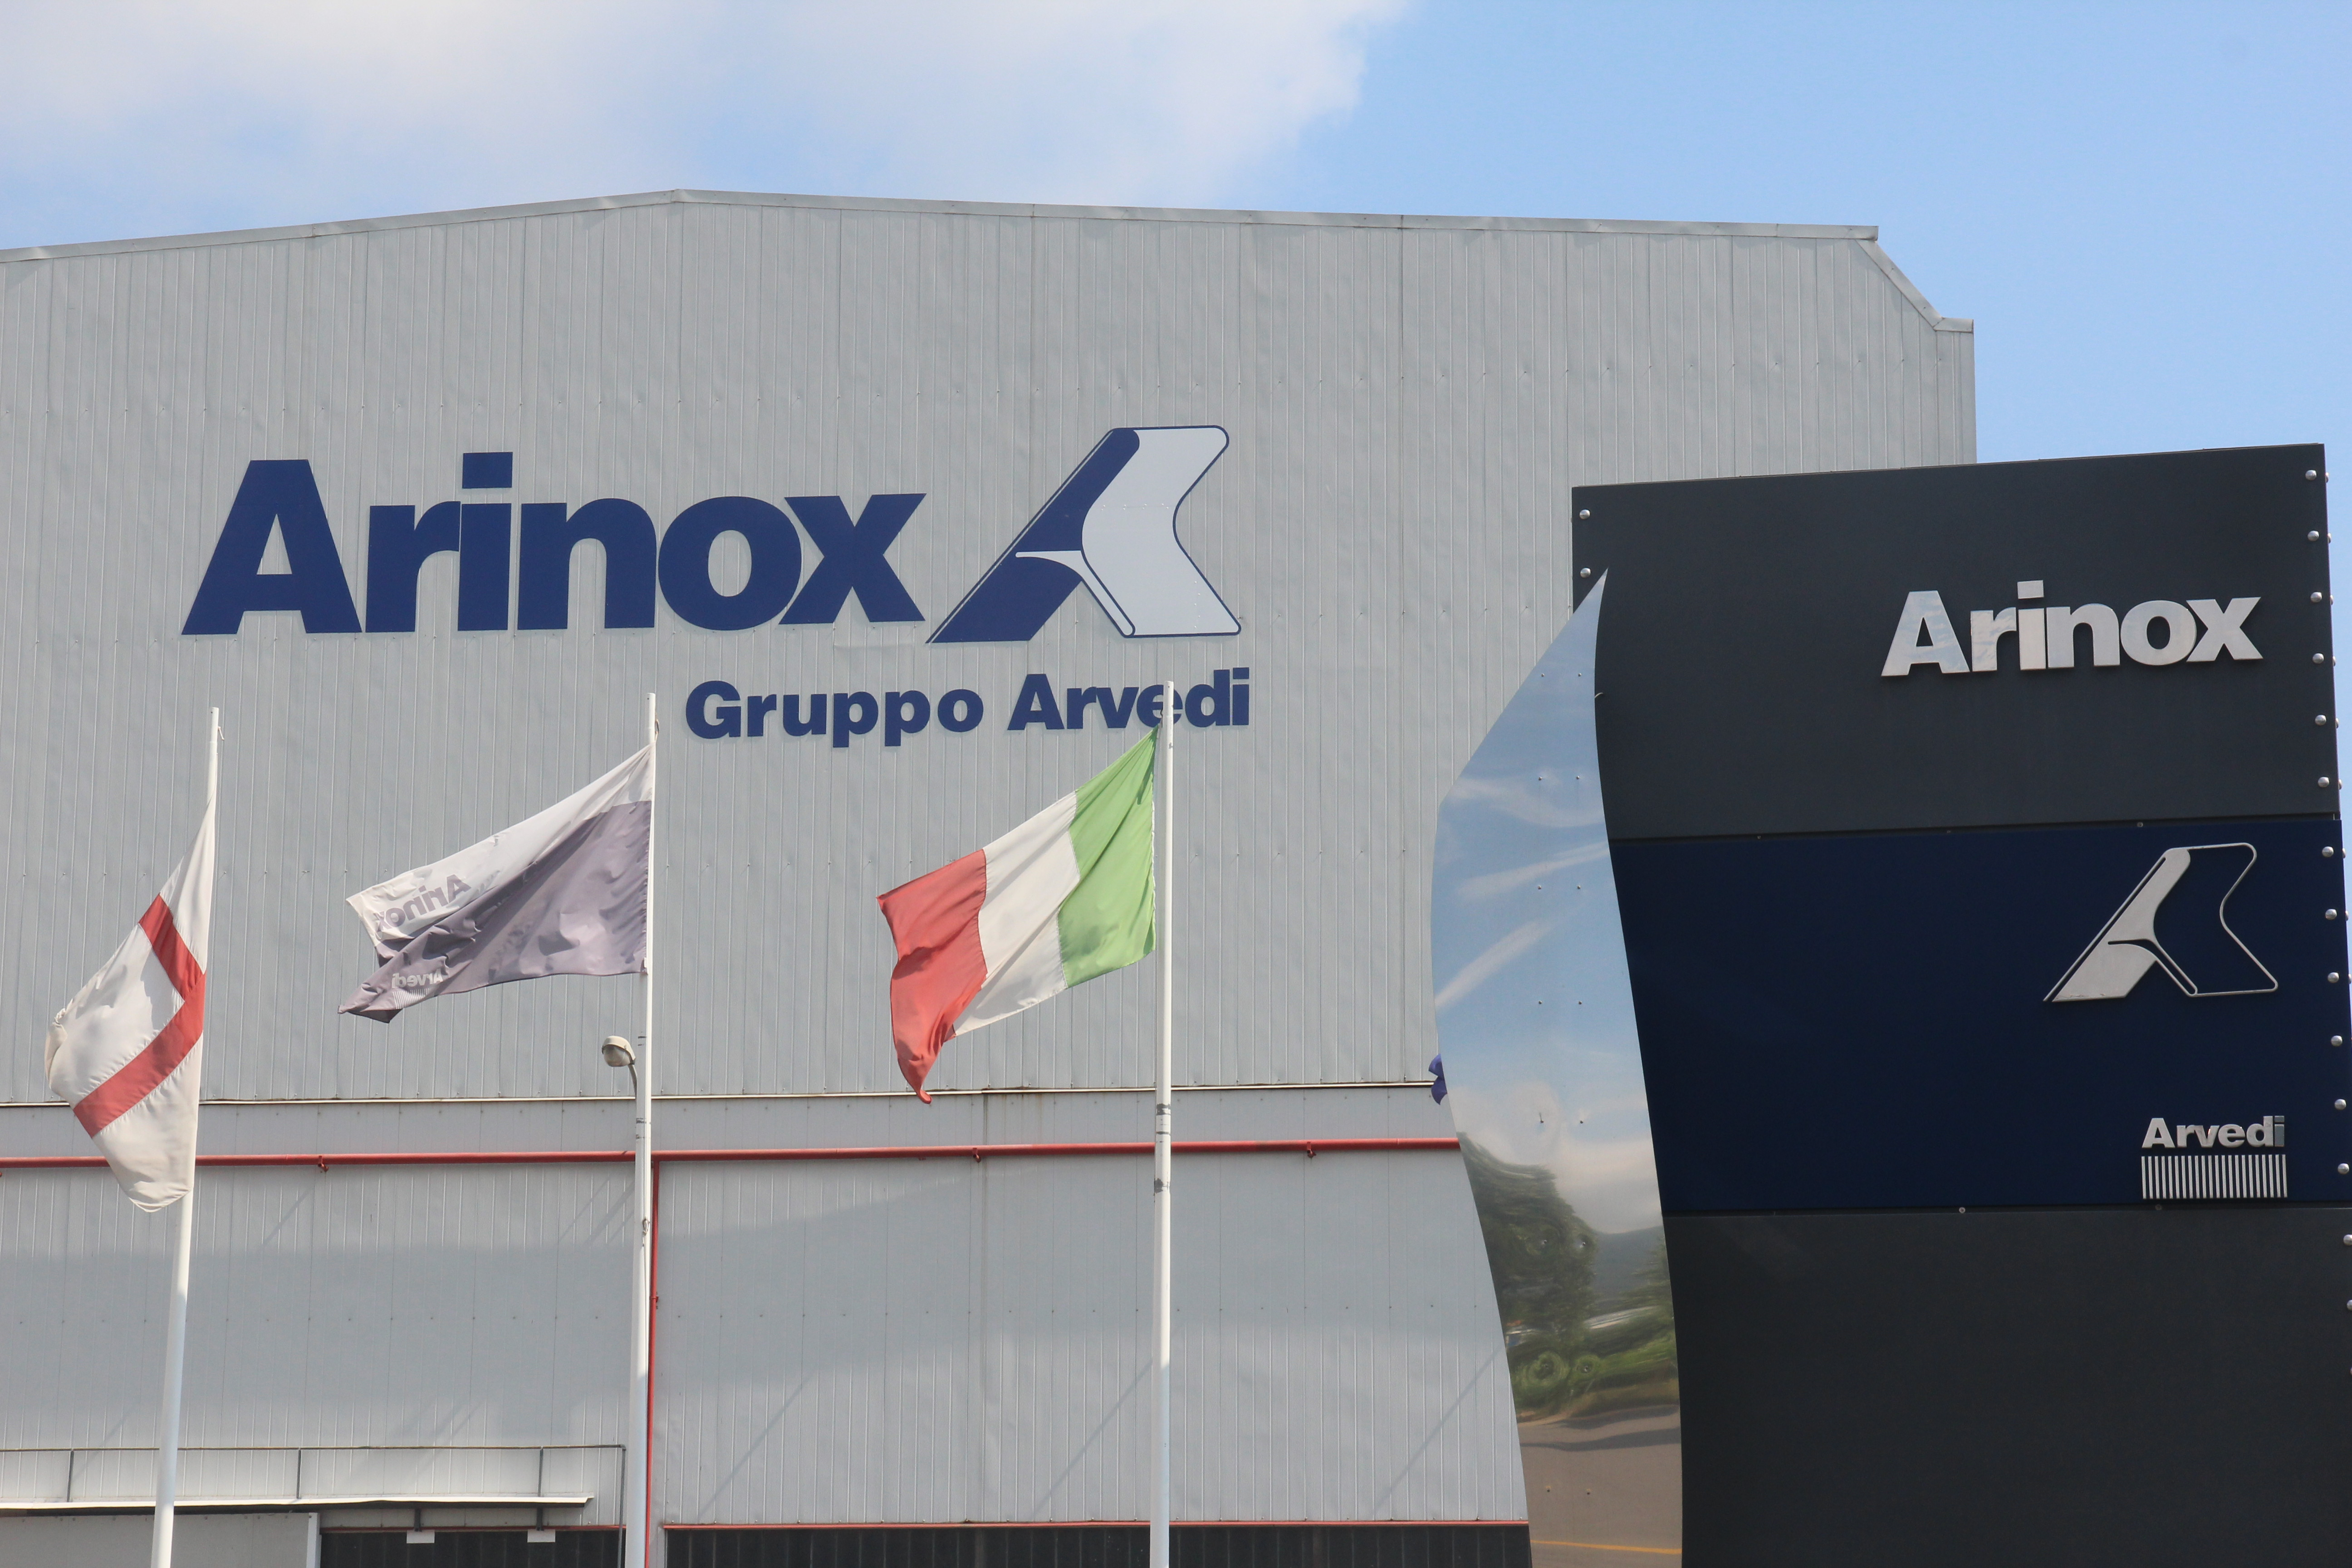 Arinox Ingresso e Logo